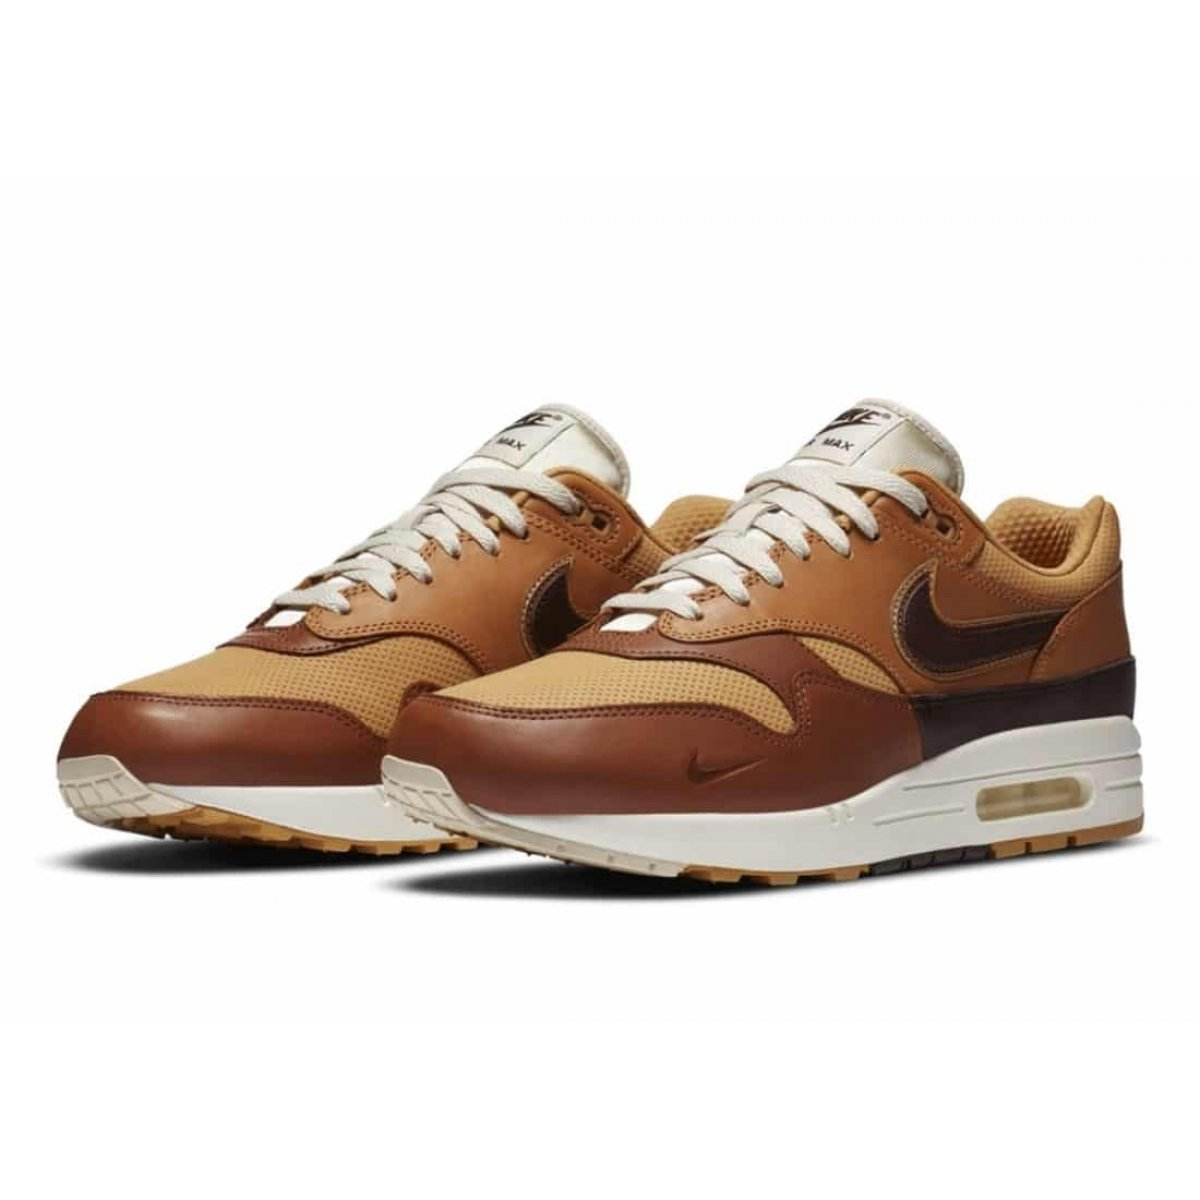 Air Max 1 Sneaker Day Brown